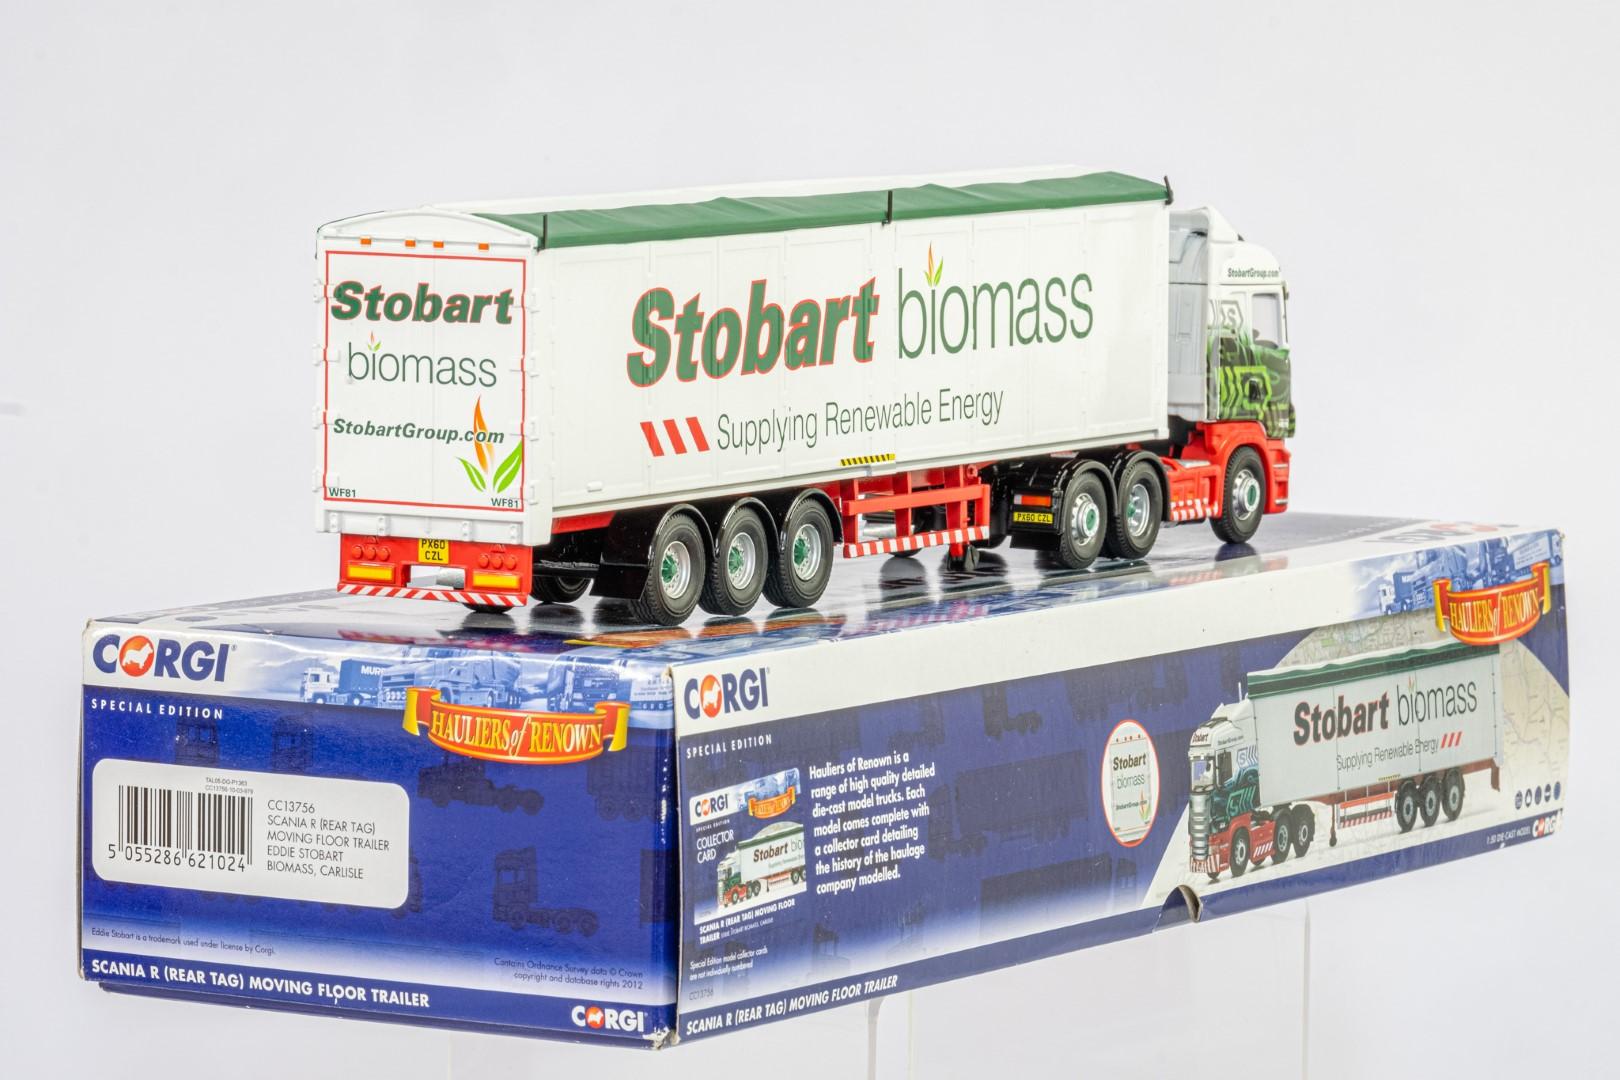 Corgi Scania R Moving Floor Trailer - Eddie Stobart Biomass - - Image 3 of 3